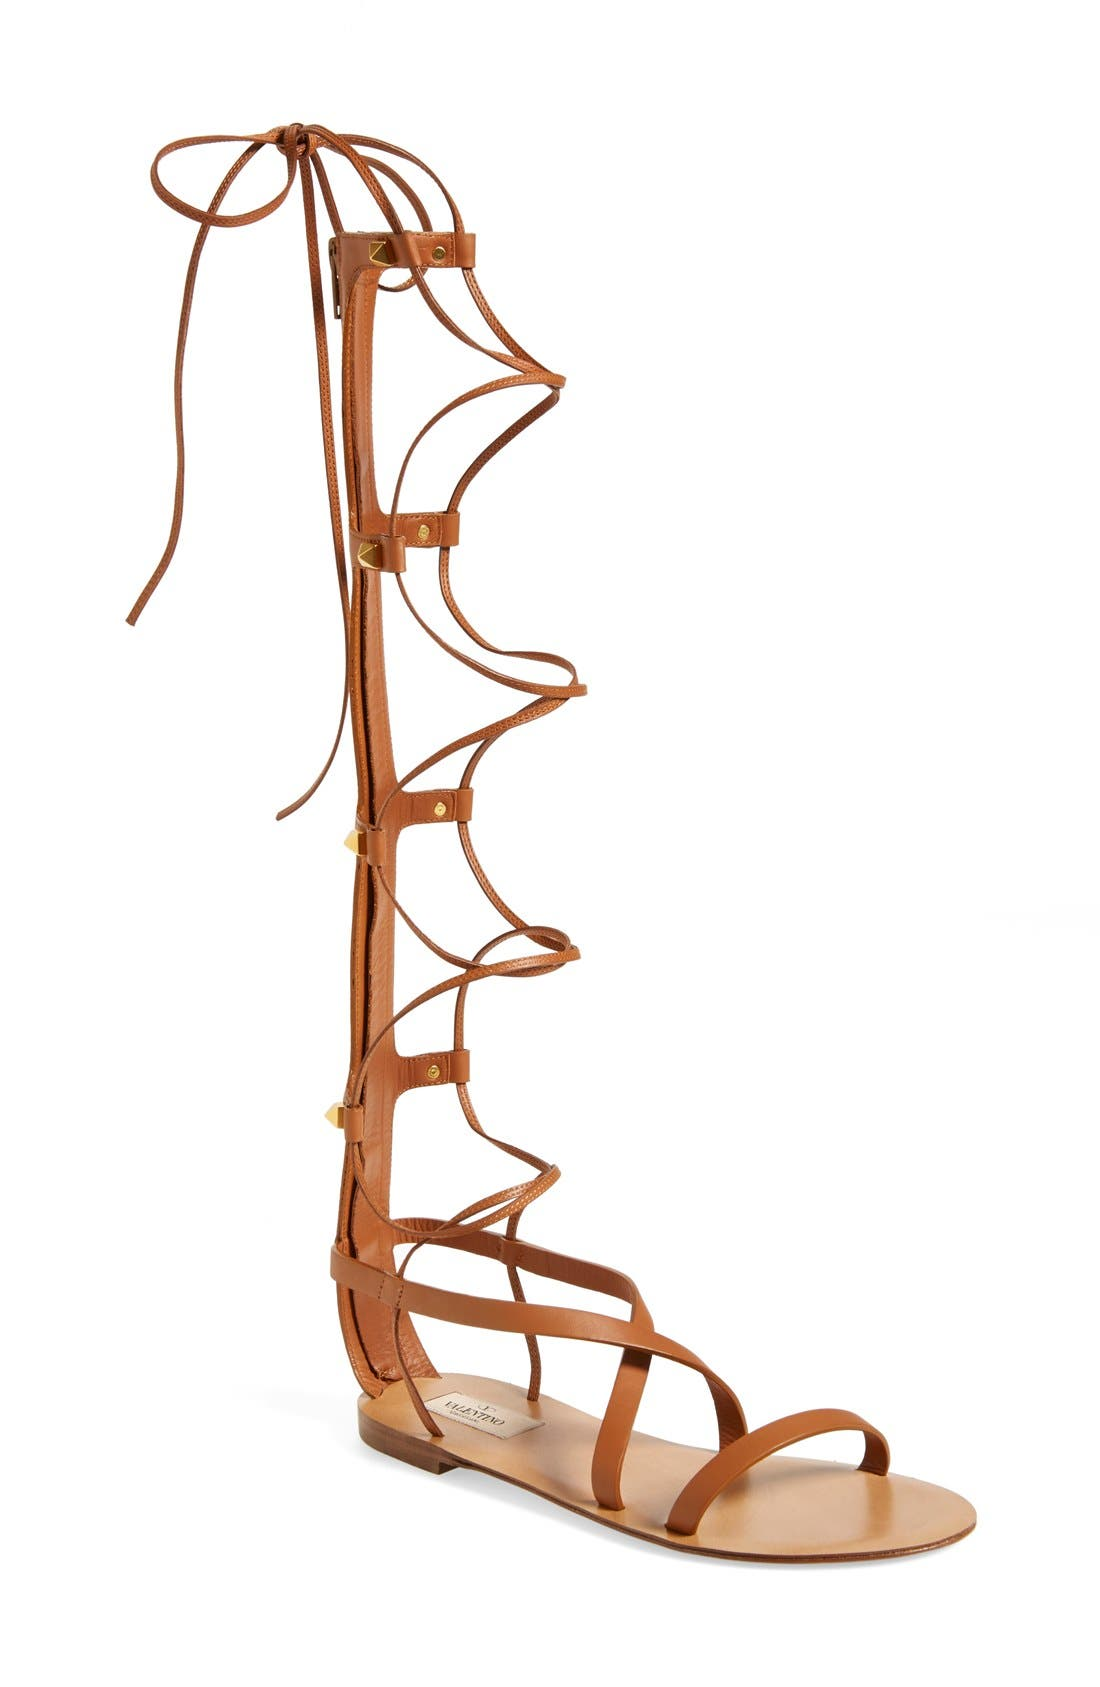 'Rockstud' Tall Gladiator Sandal,                             Main thumbnail 1, color,                             200